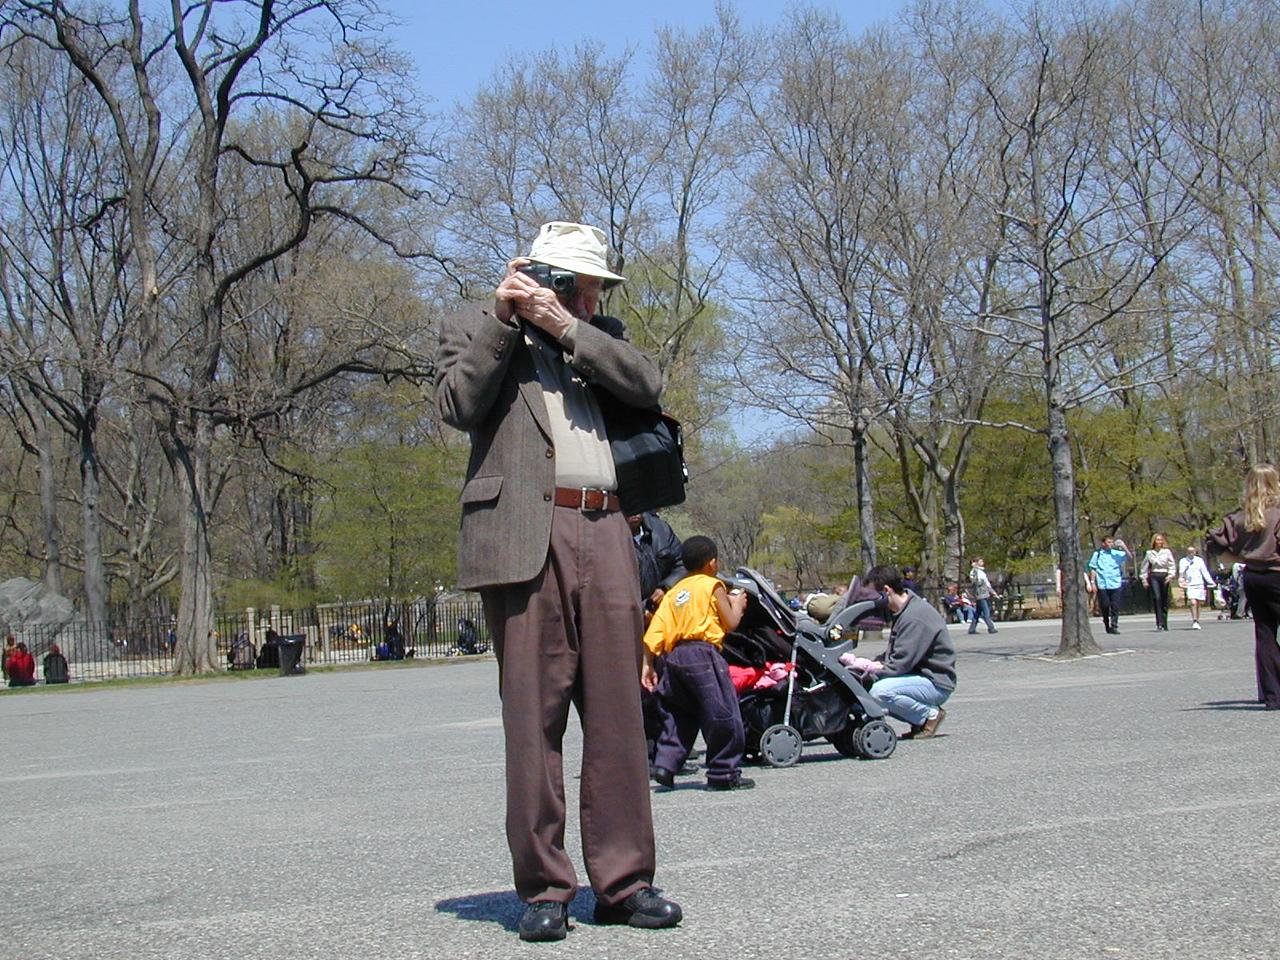 Central Park, NYC. April 2000.